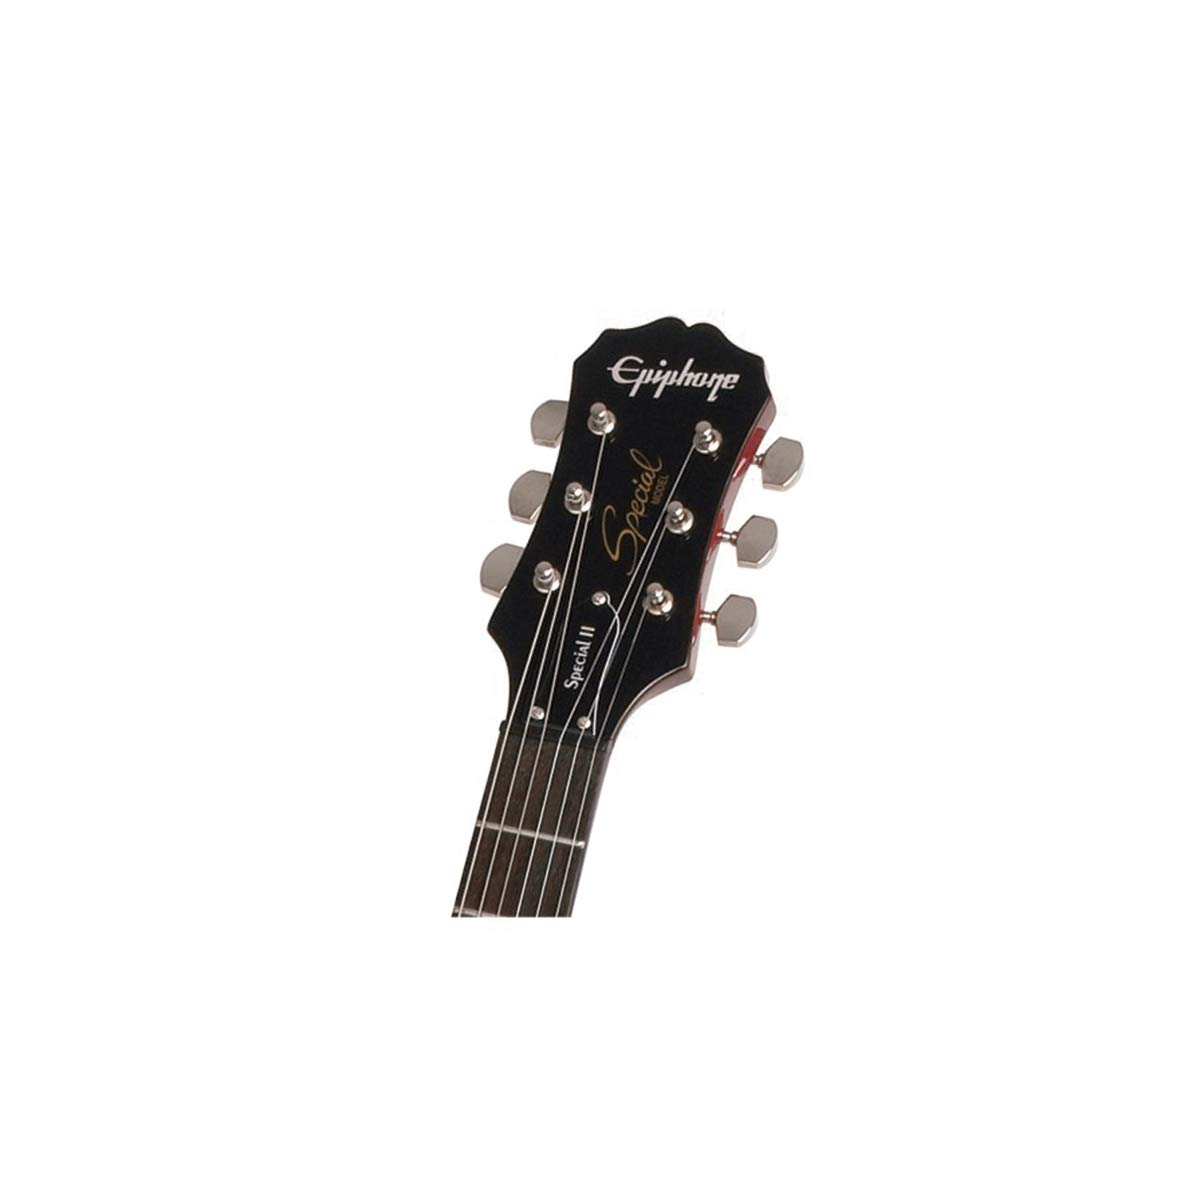 Guitarra Les Paul Special Heritage Cherry Sunburst - Epiphone